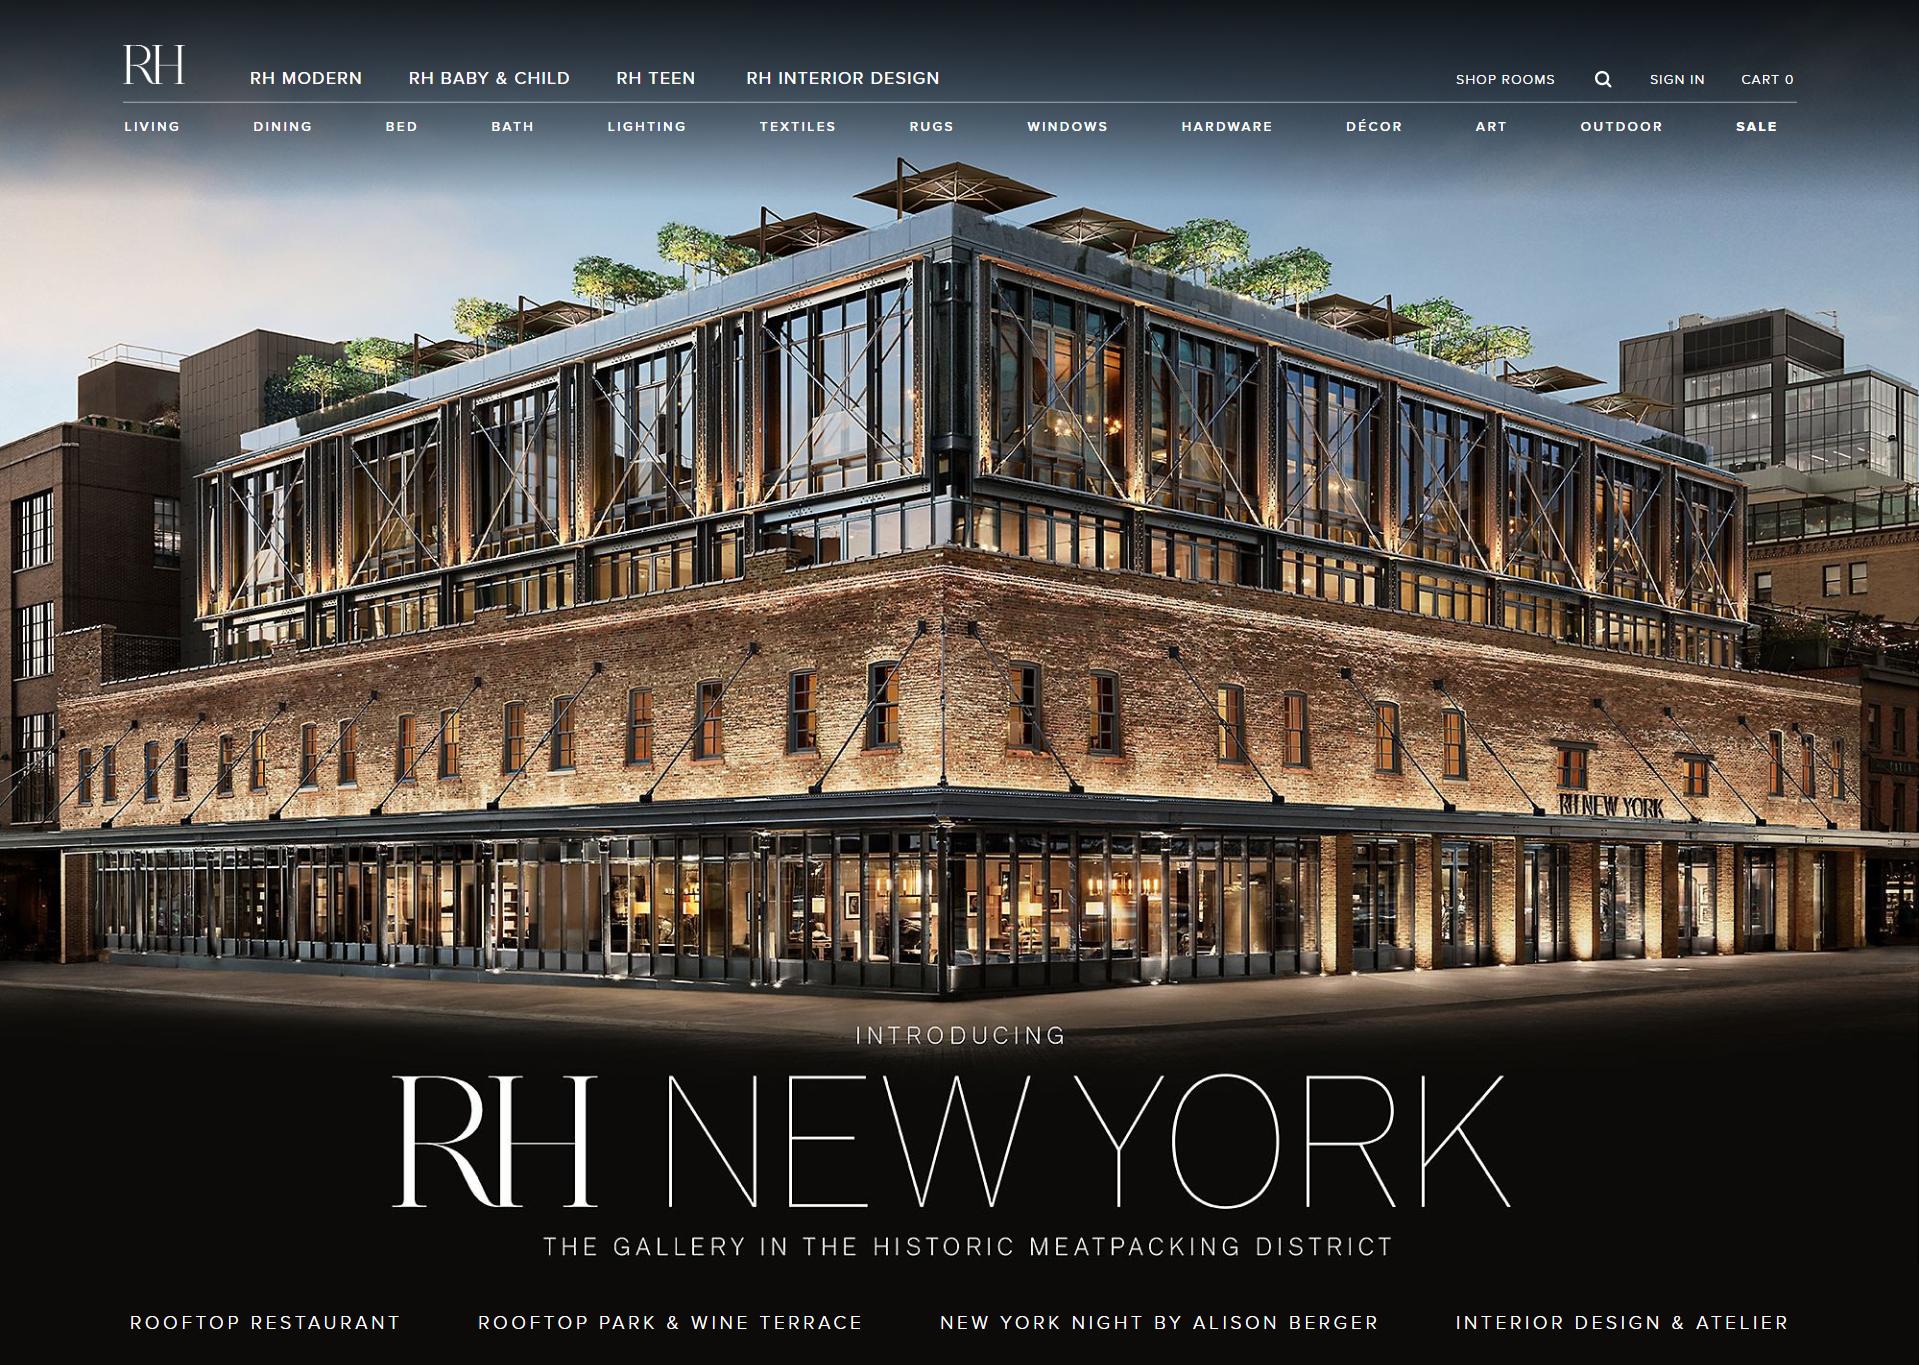 RH NEWYORK-web.png